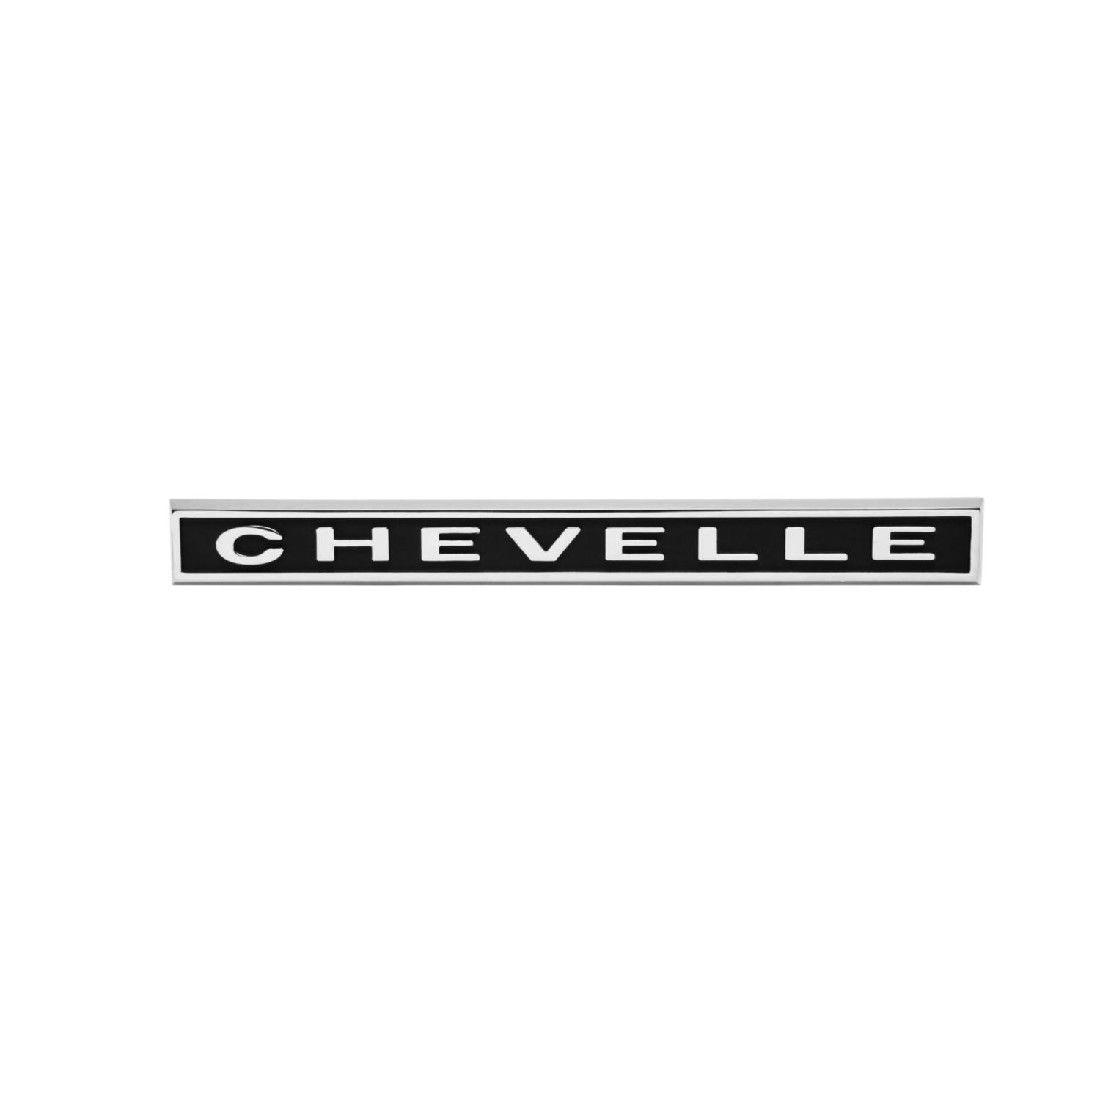 1967 Chevelle Trunk Emblem